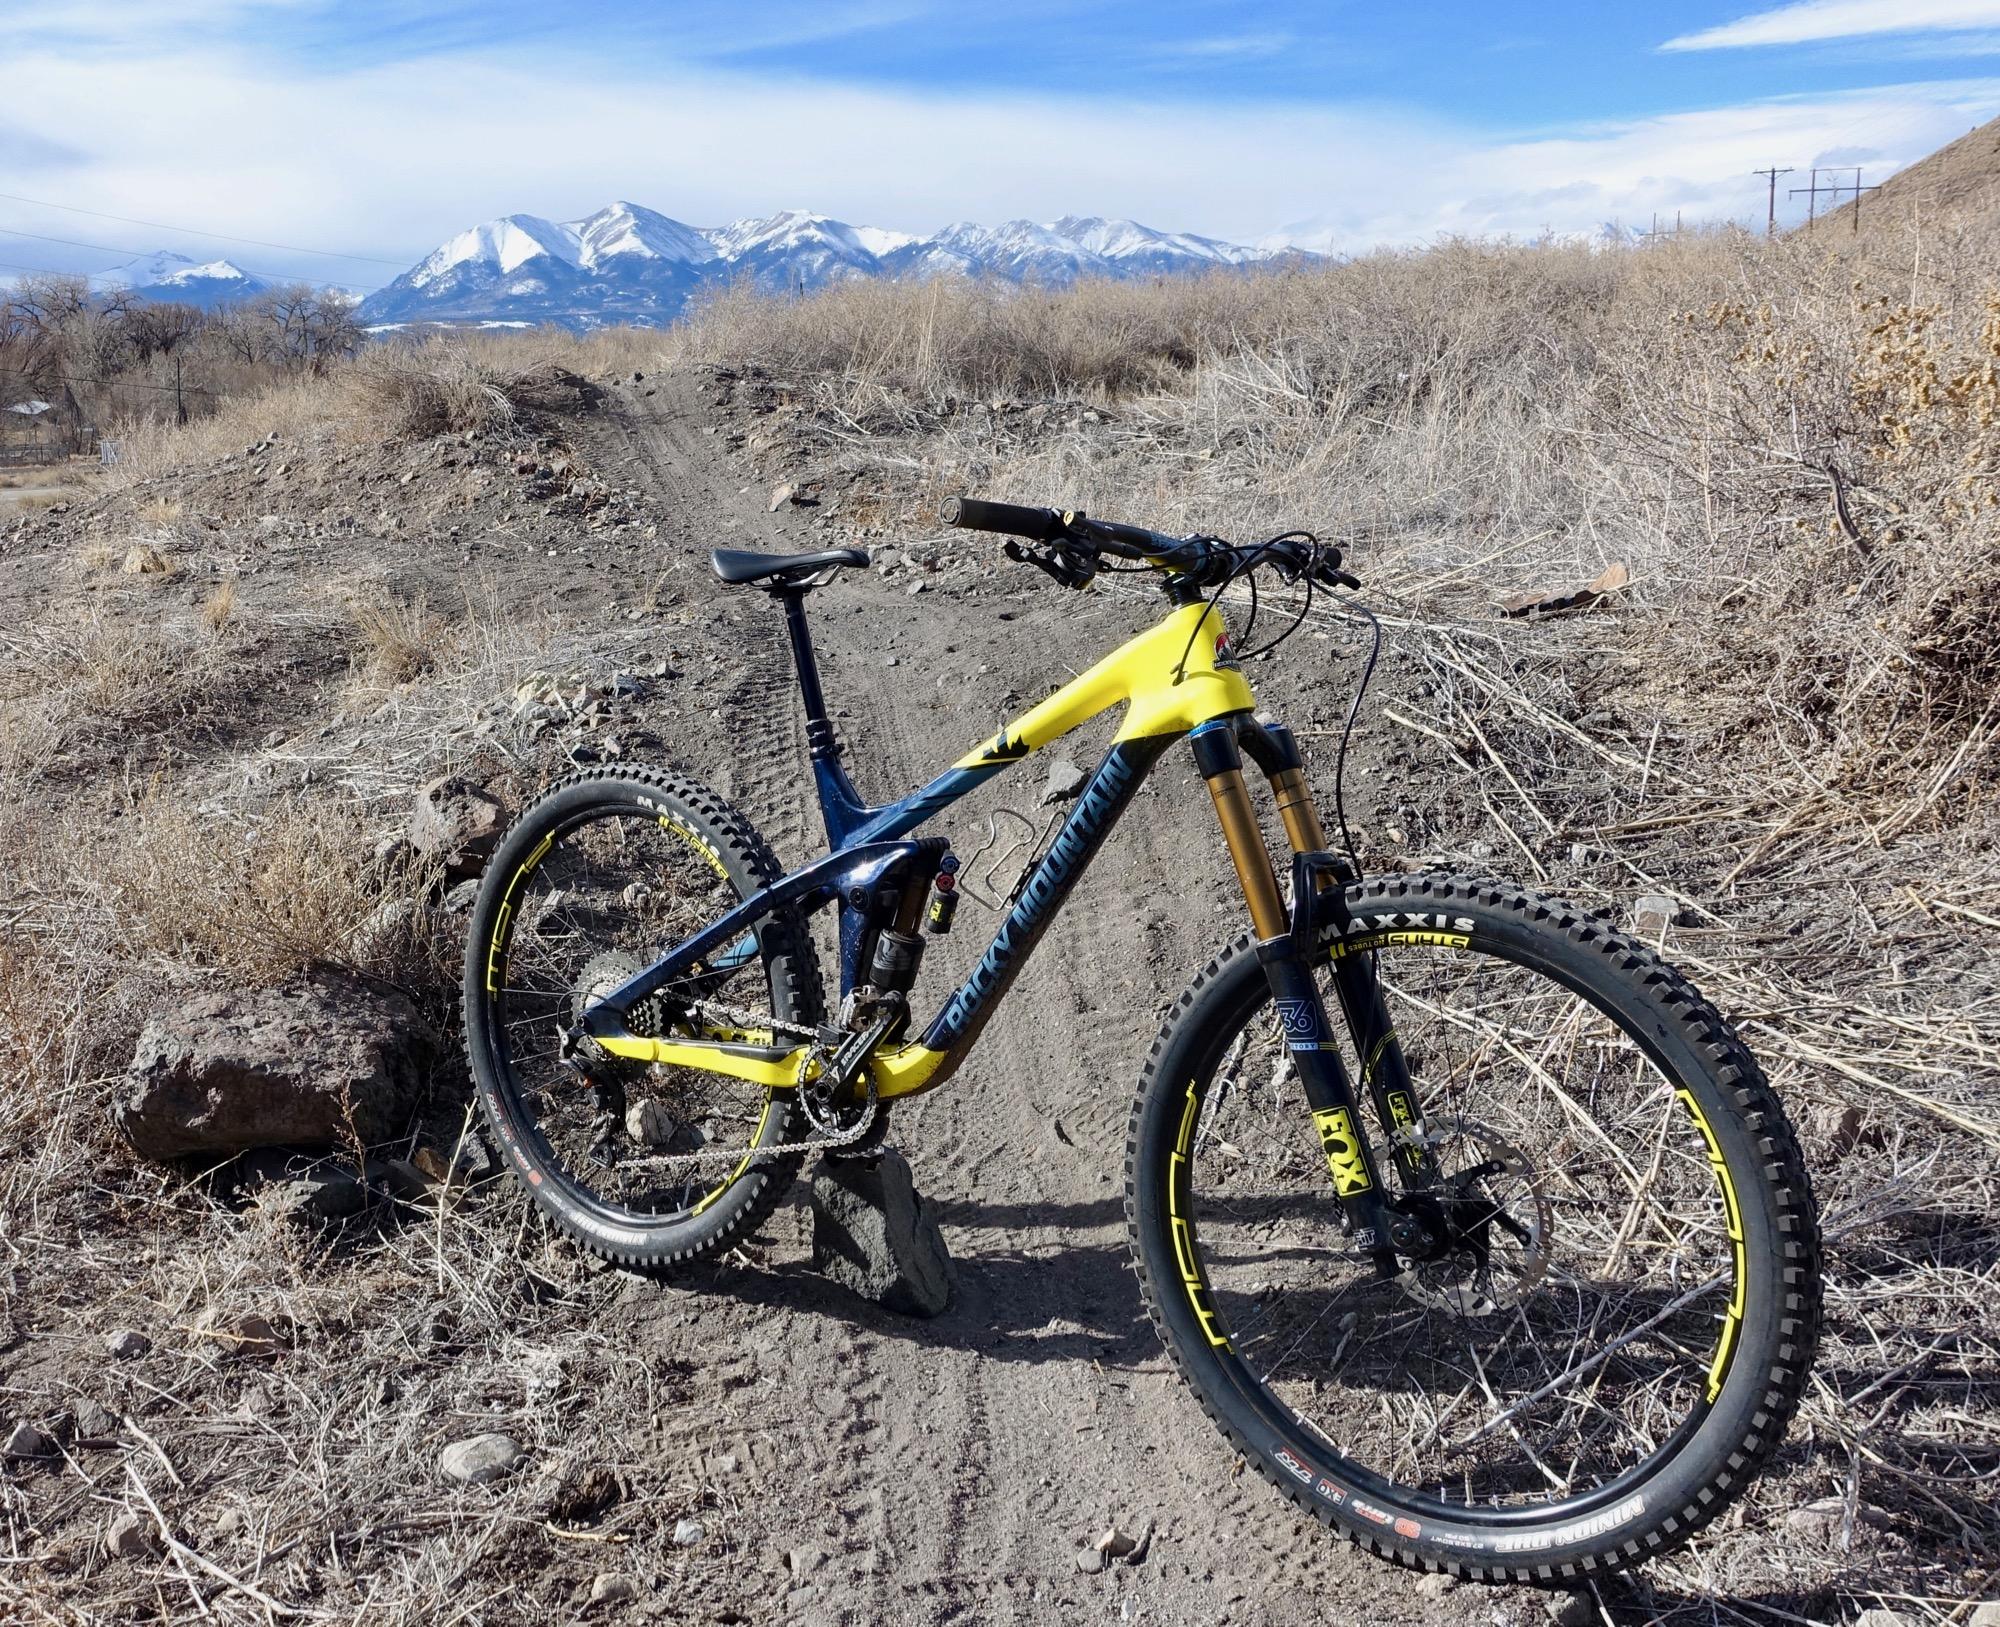 25628edf9ba Rocky Mountain Slayer 790 MSL Review - Singletracks Mountain Bike News